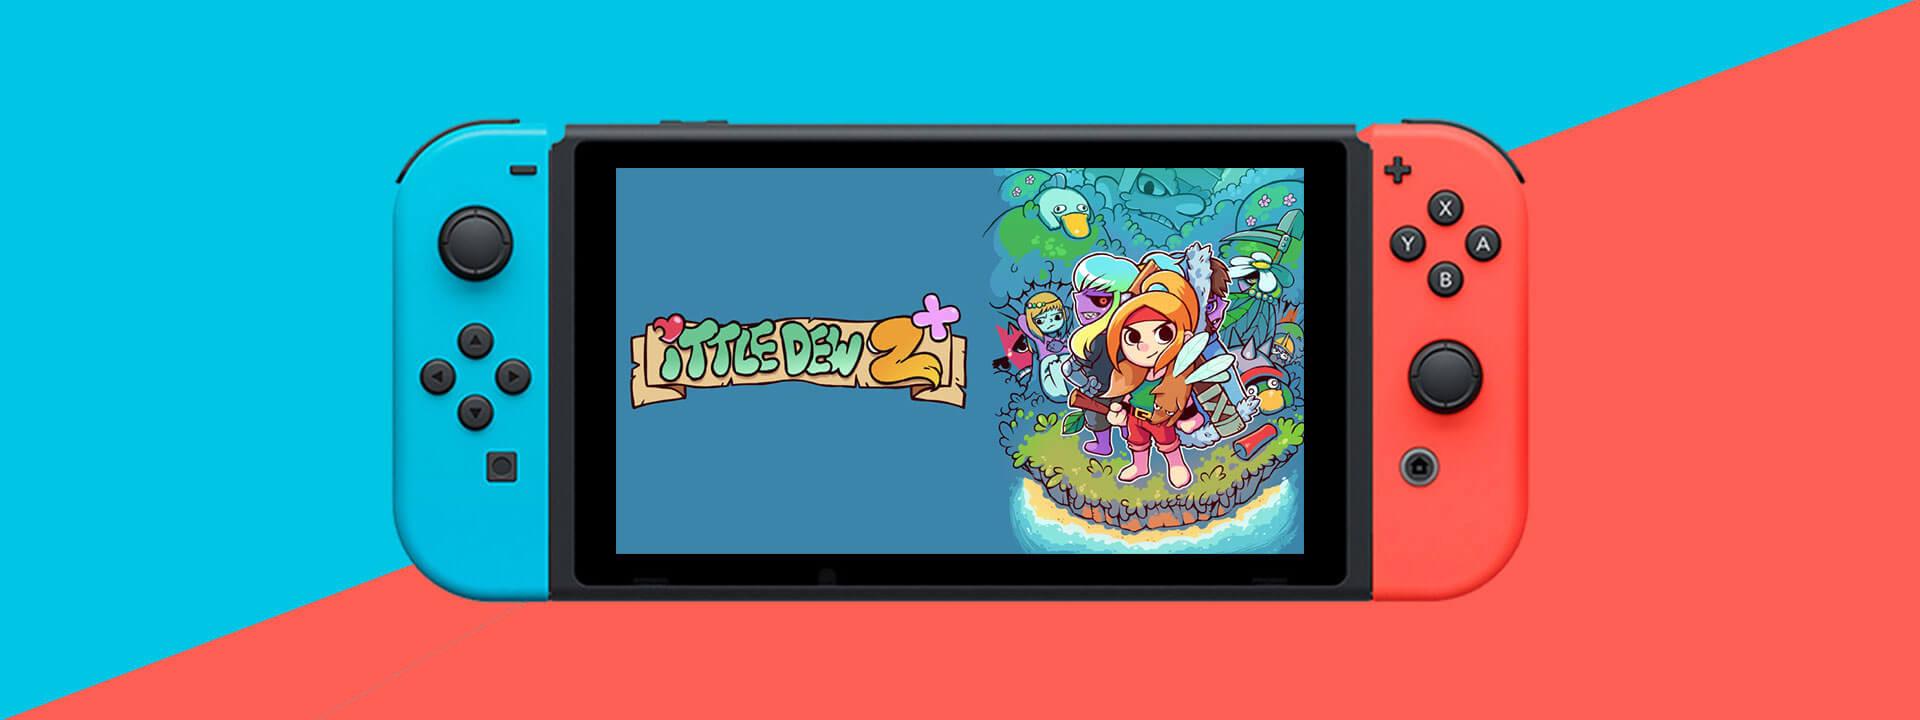 Ittle Dew 2 nintendo switch 01 - بازی Ittle Dew 2 مخصوص Nintendo Switch